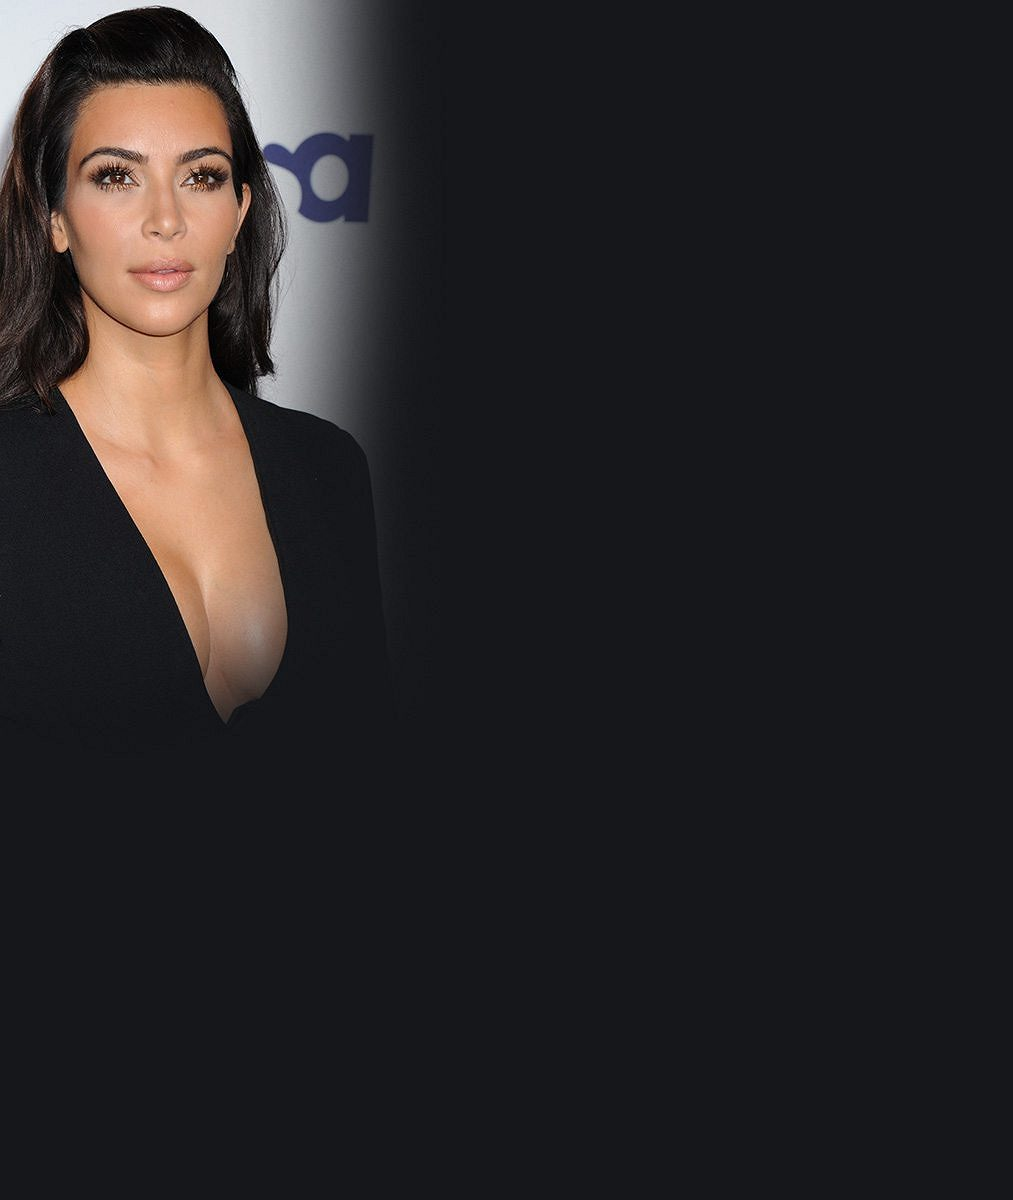 Namyšlená Kim Kardashian vydá knihu selfies. Ponese název Egoistka